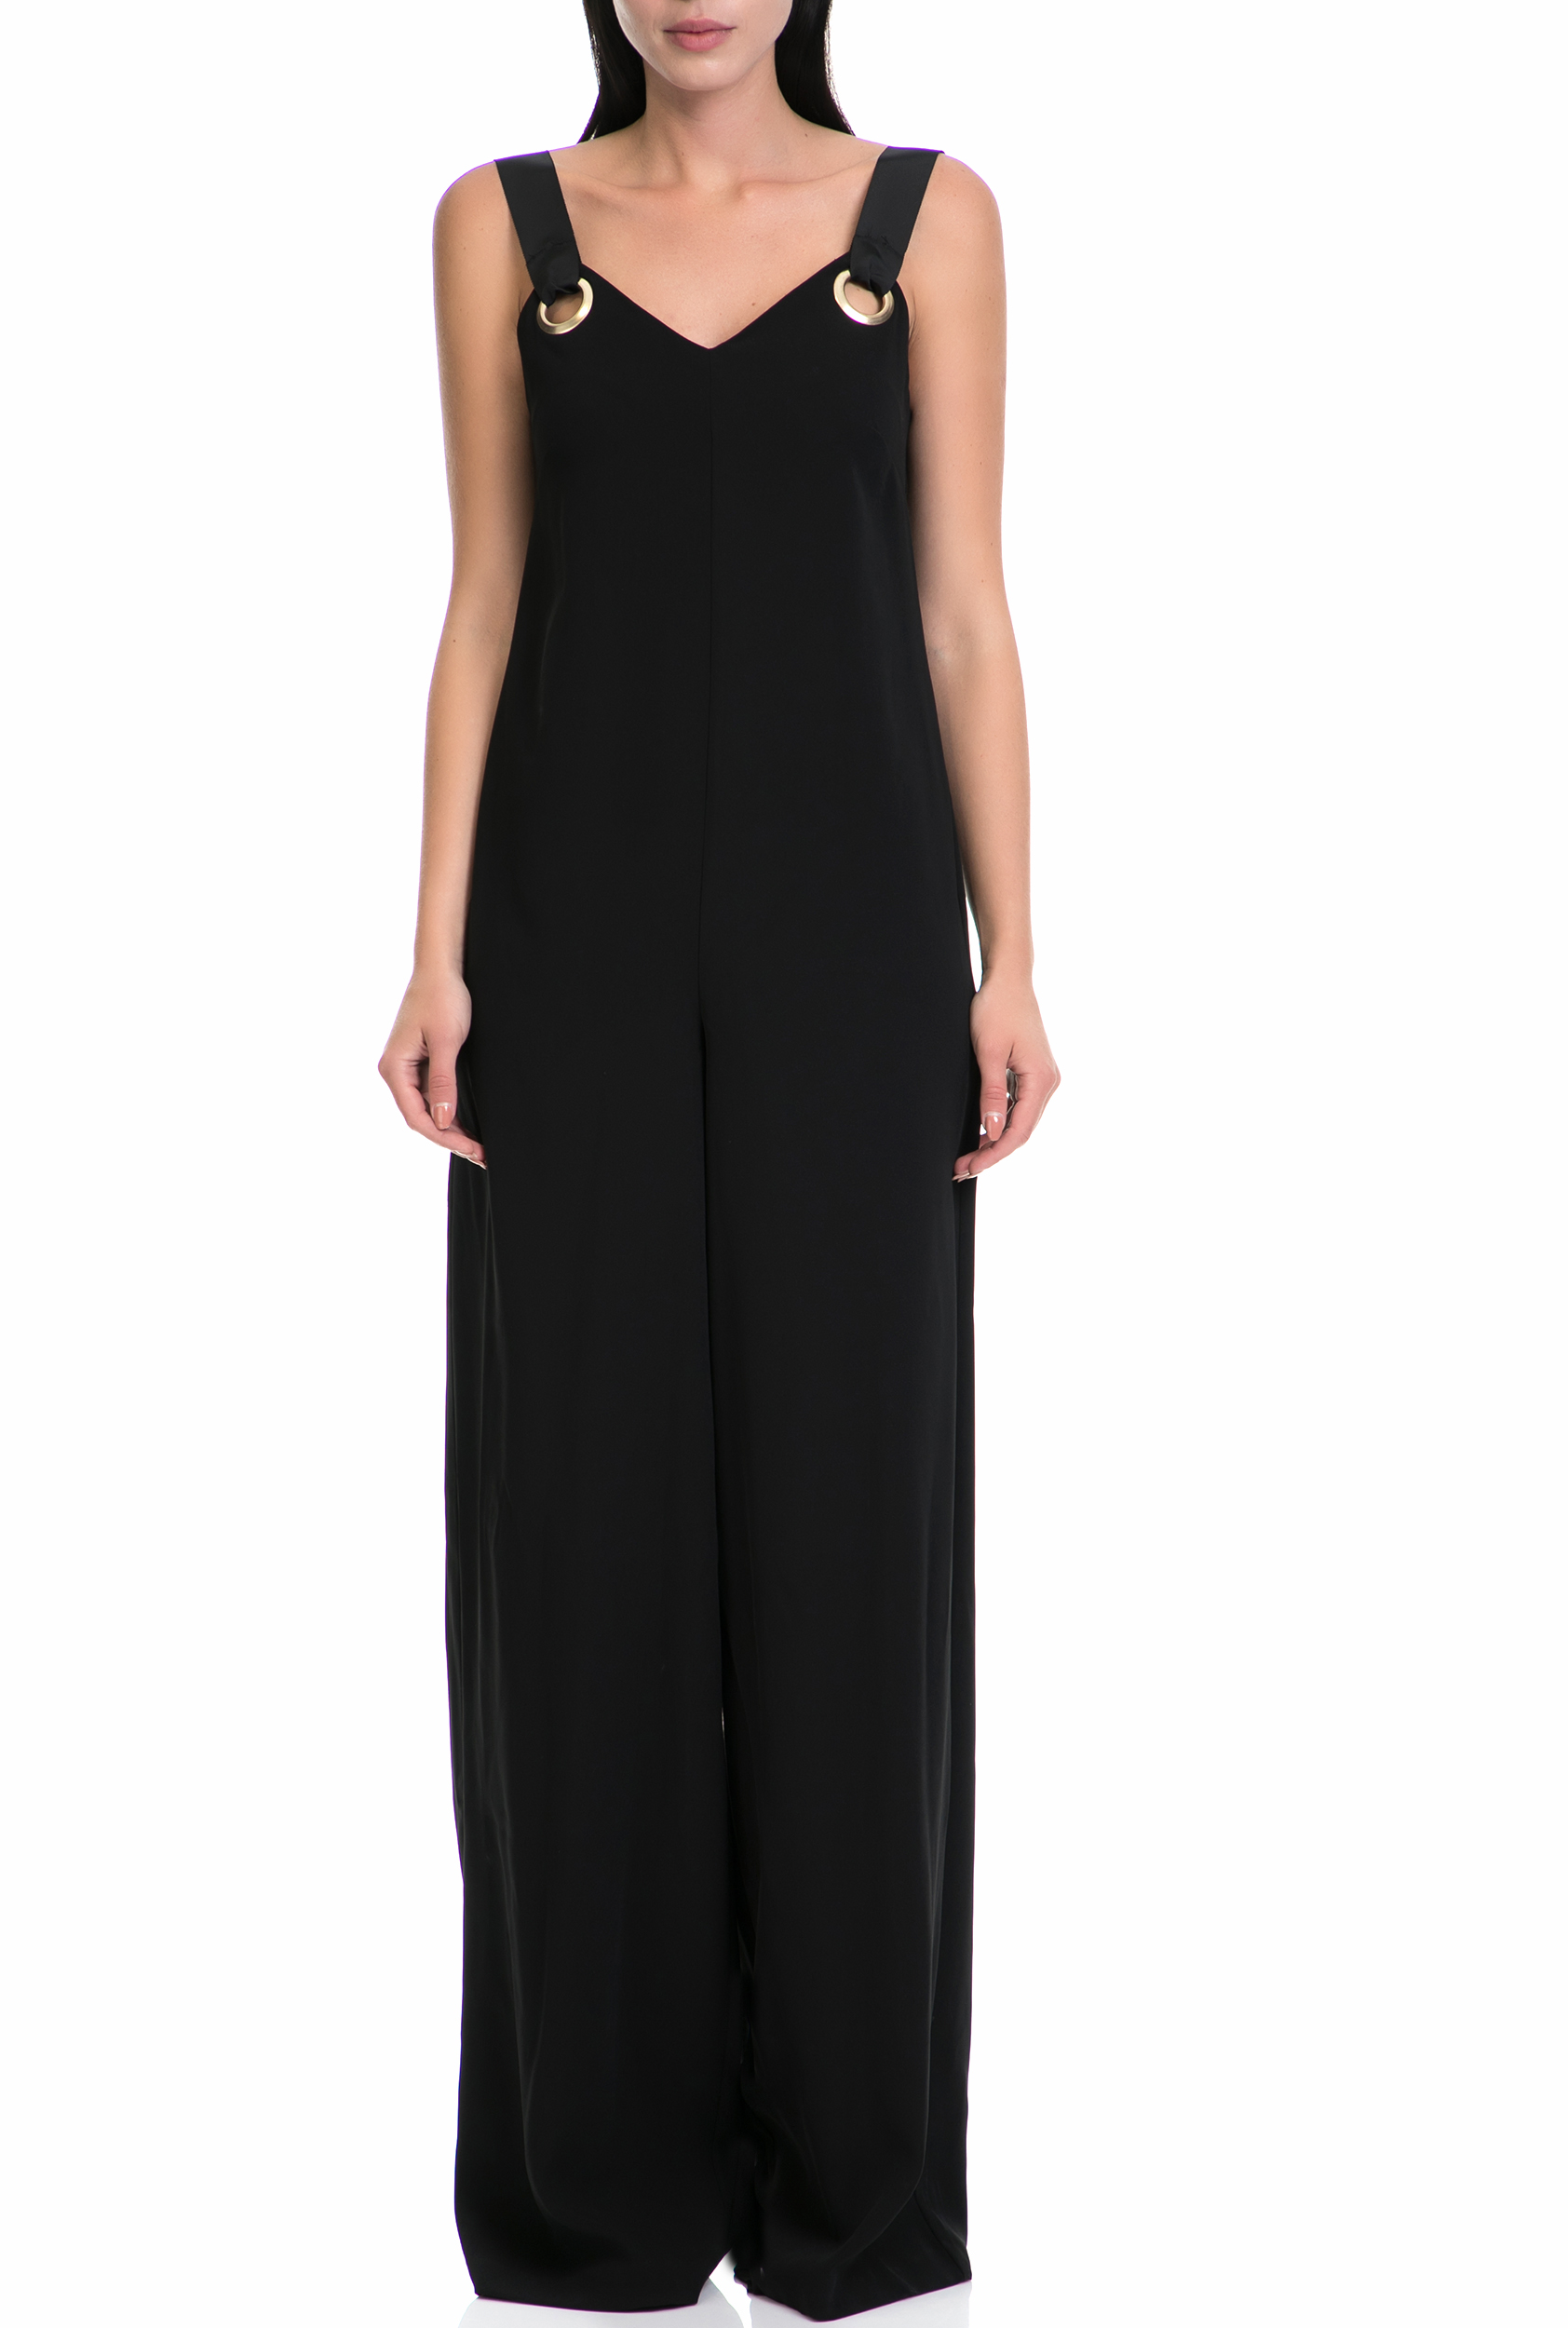 GUESS - Γυναικεία ολόσωμη φόρμα LUBIA GUESS μαύρη γυναικεία ρούχα ολόσωμες φόρμες